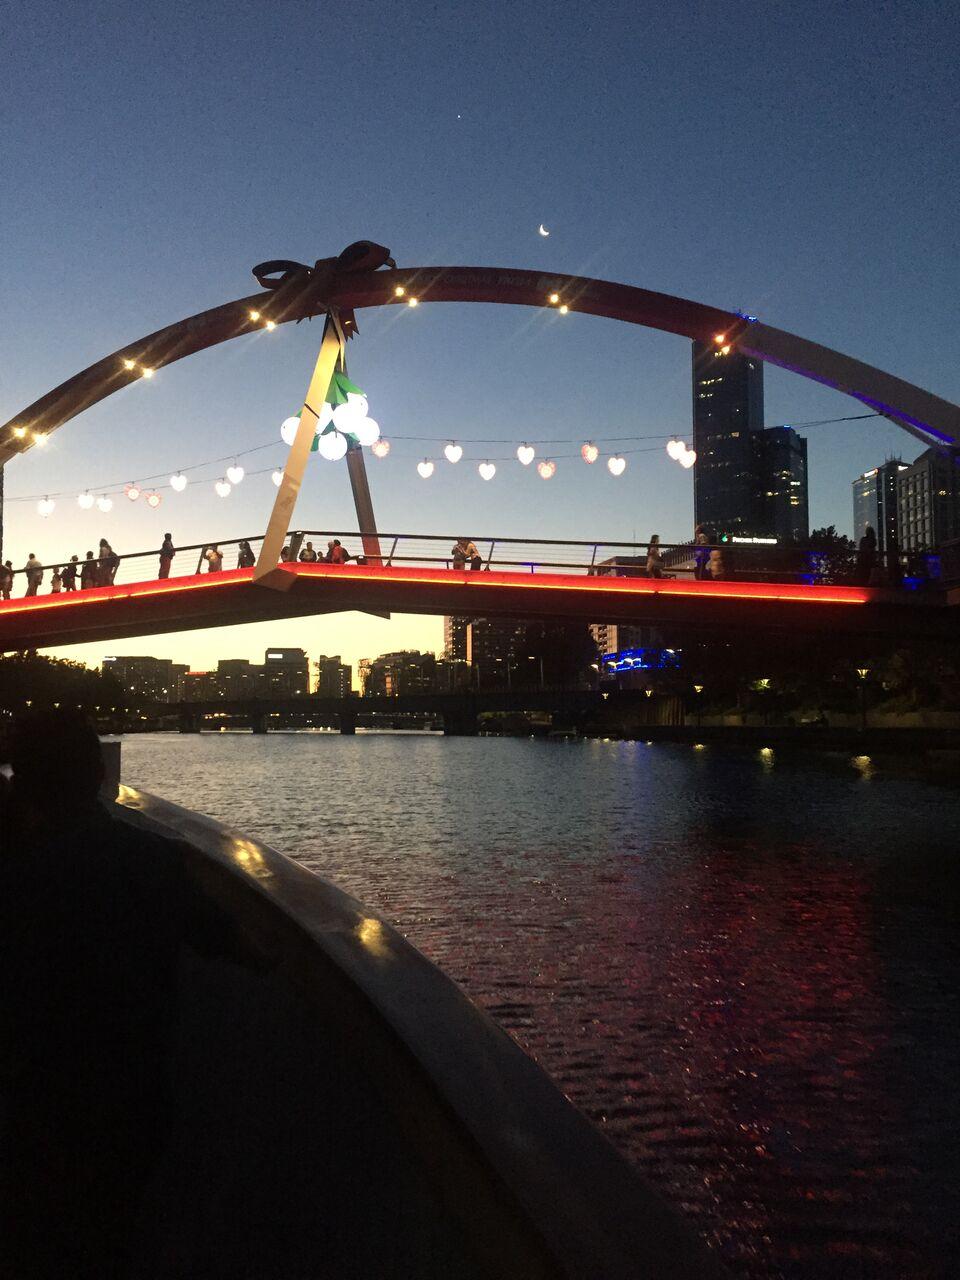 skippered boats for office event hire, Docklands Melbourne